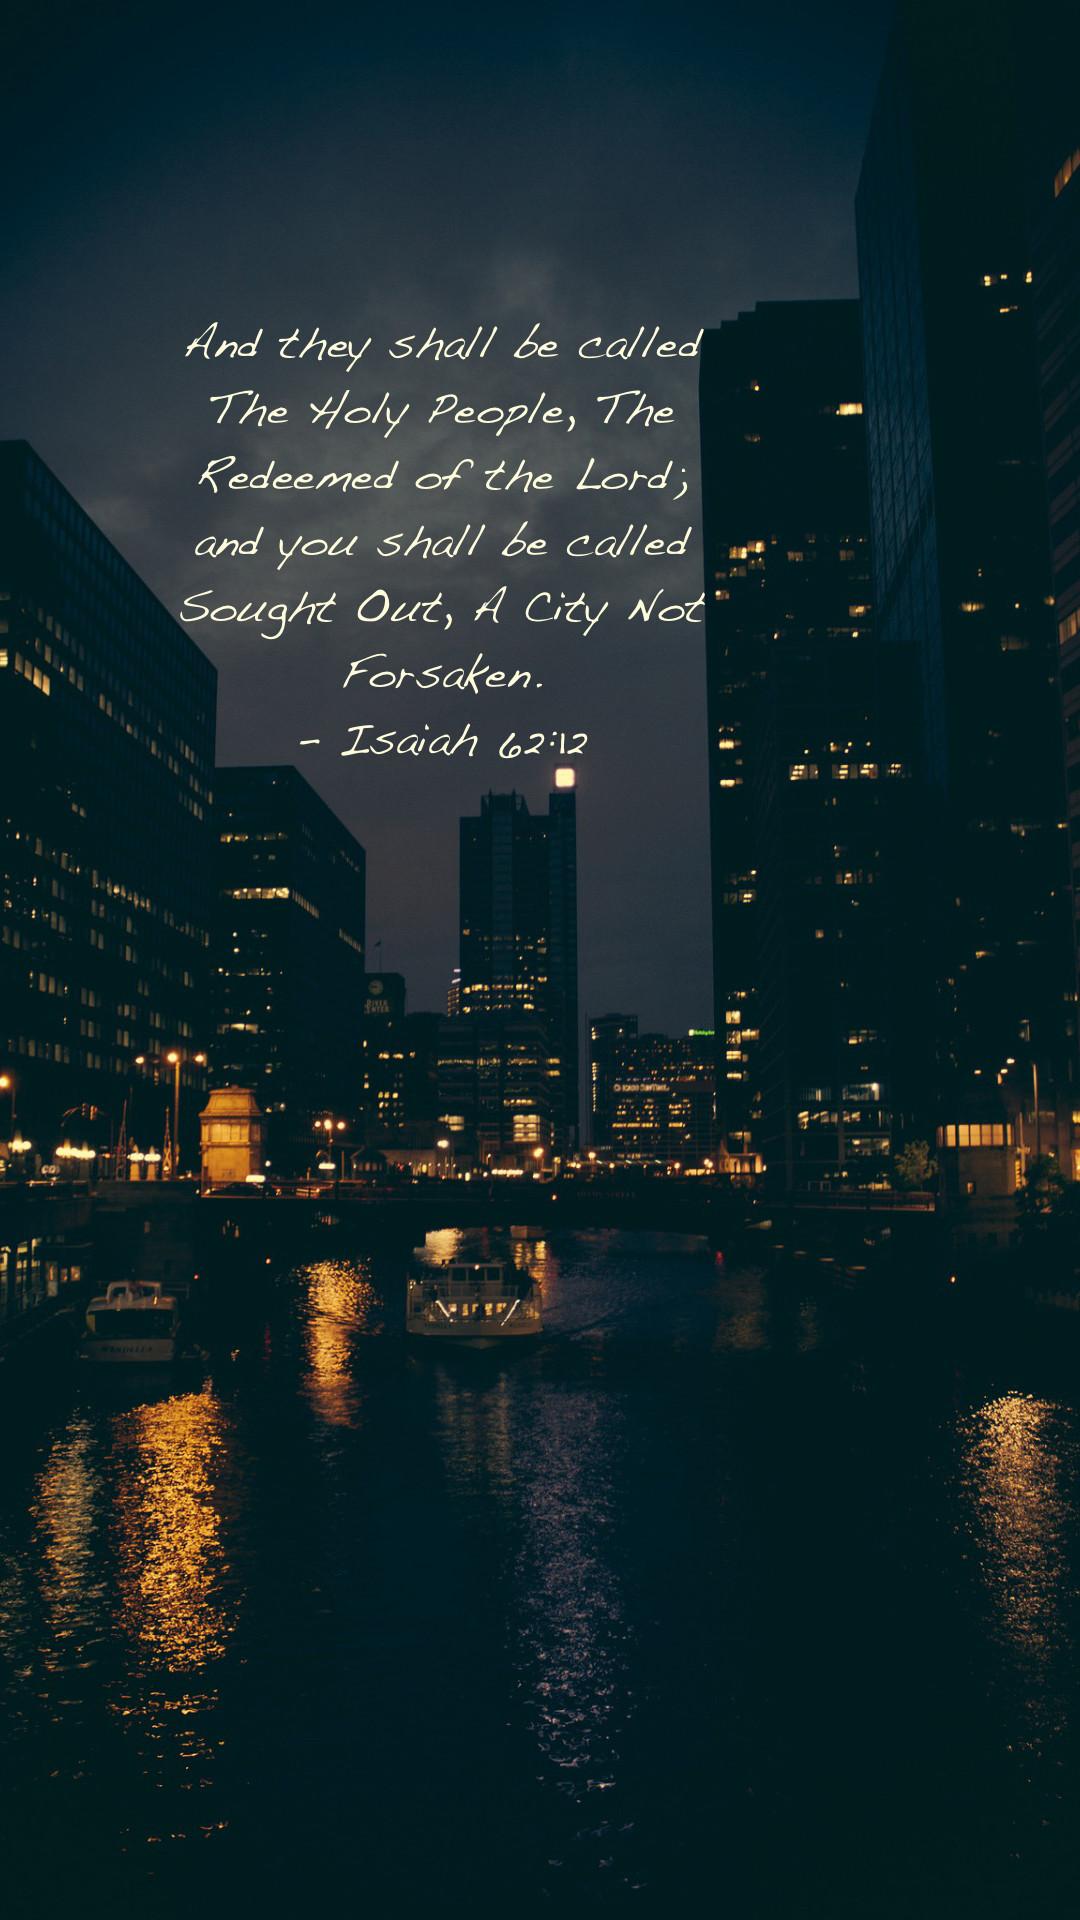 Fall Scripture Iphone Wallpaper Inspirational Bible Verses Wallpaper 183 ①